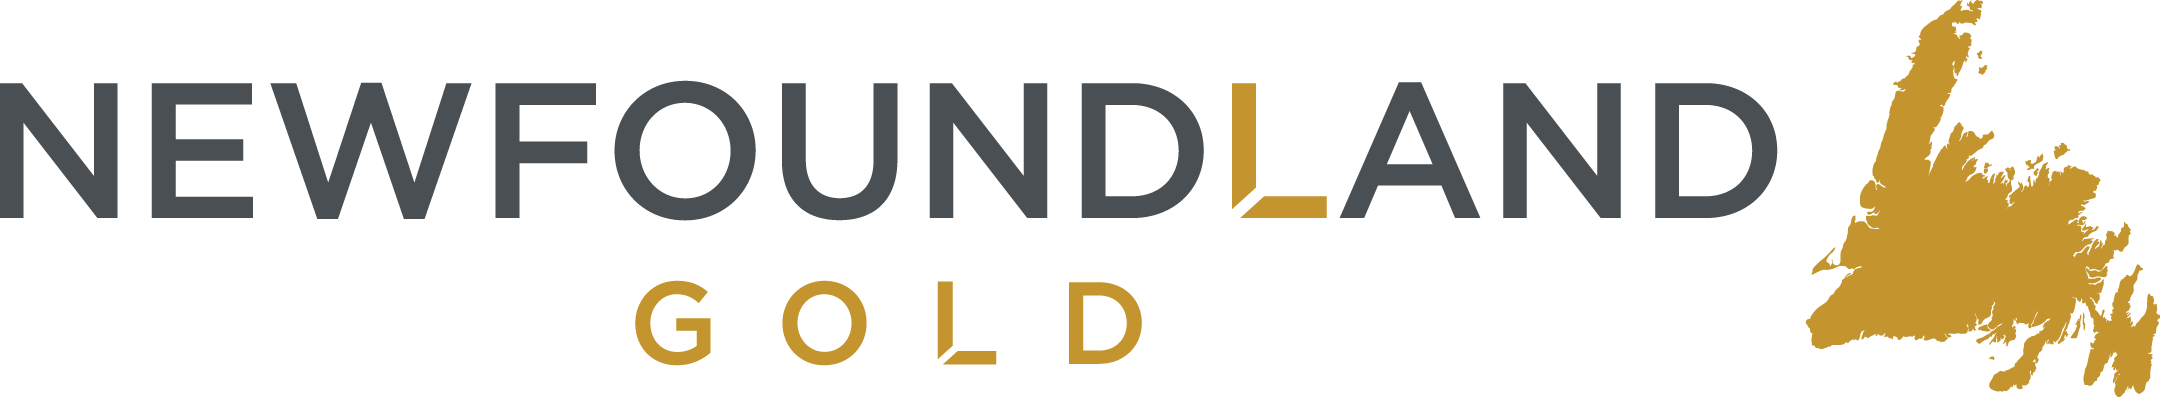 Newfoundland Gold